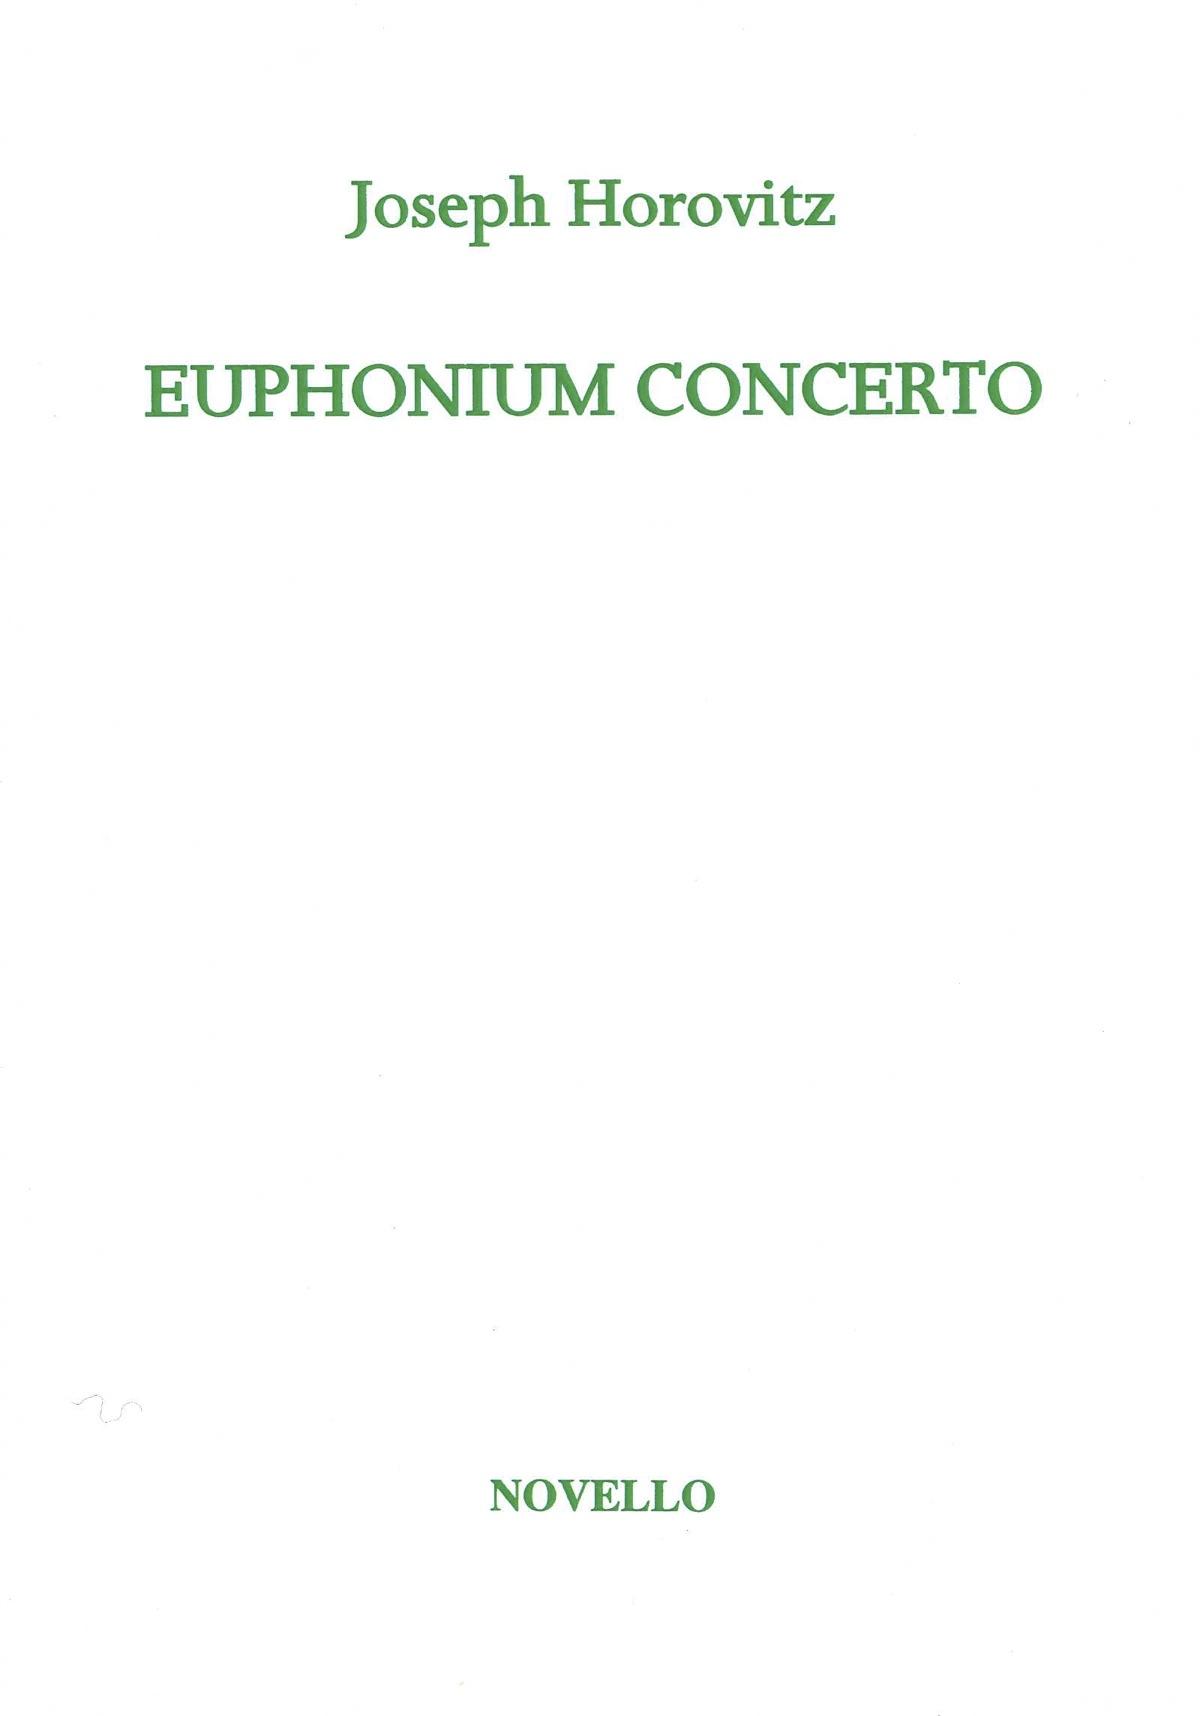 Euphonium Concerto - Joseph Horovitz - Euphonium and Piano